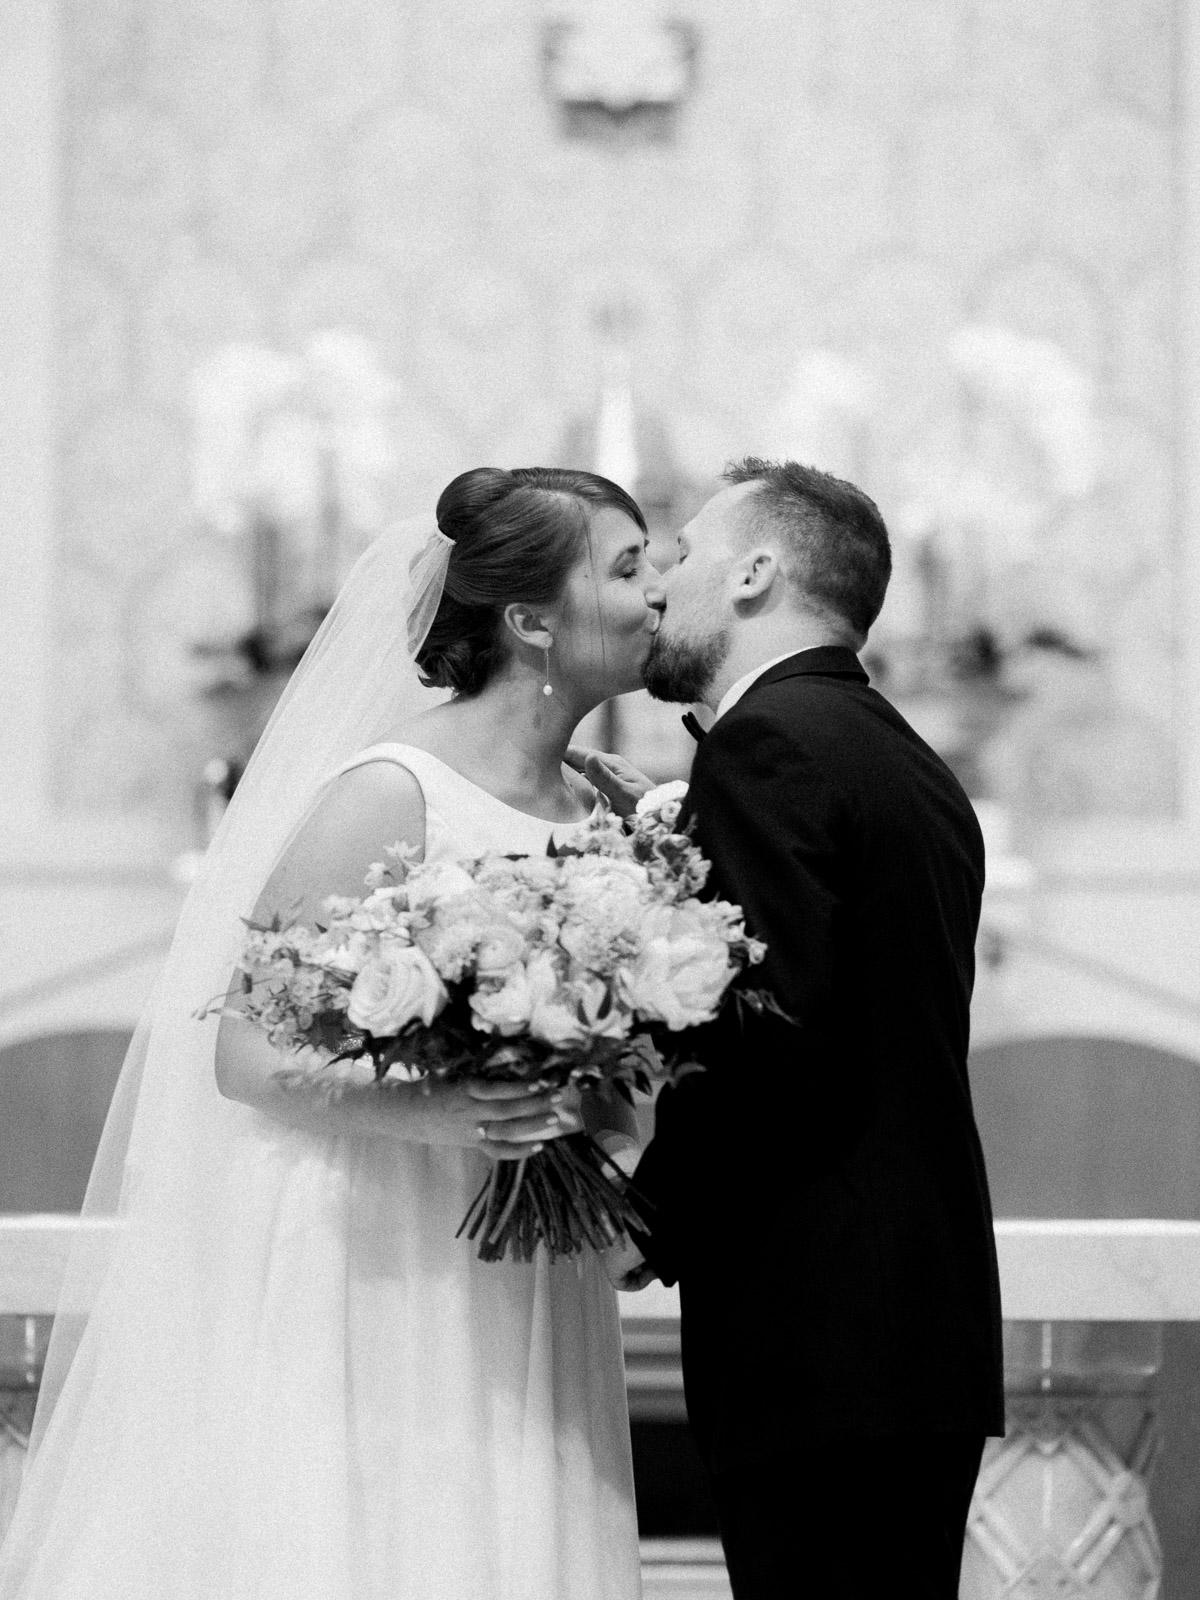 Bright and Joyful Cleveland Wedding Photography at Music Box Supper Club-20.jpg